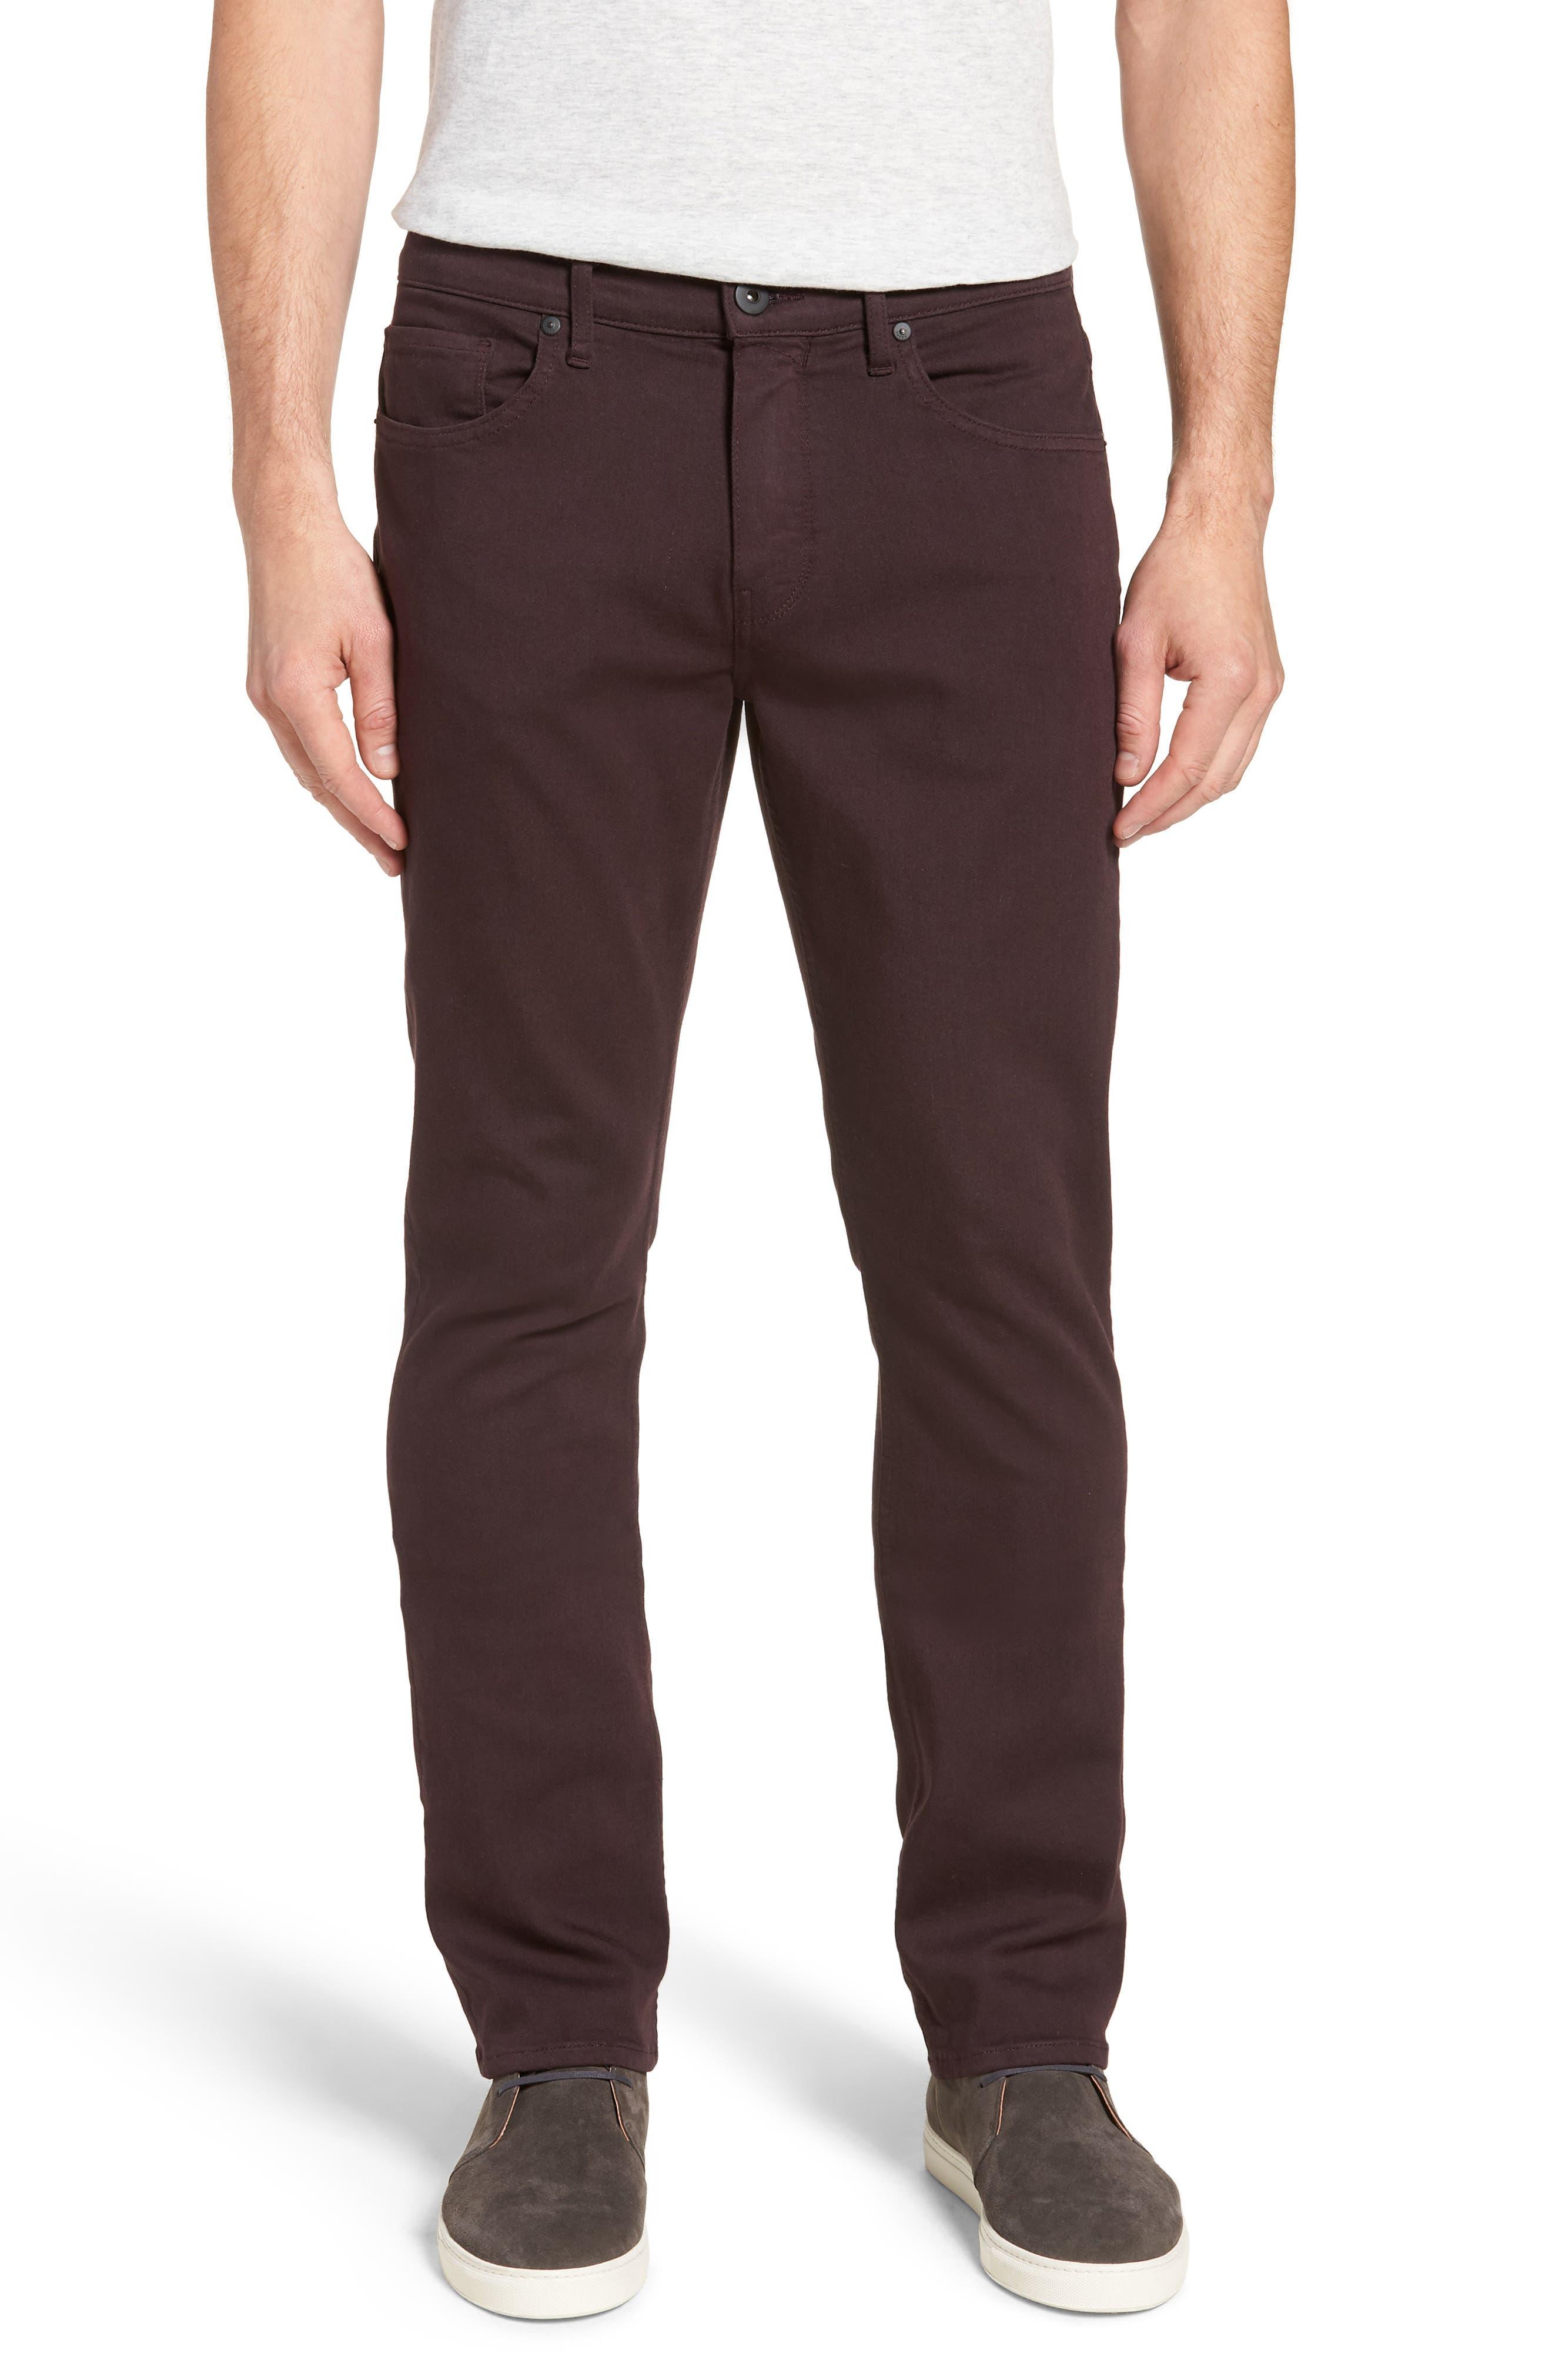 Transcend - Federal Slim Straight Fit Jeans,                         Main,                         color, DARK PORT